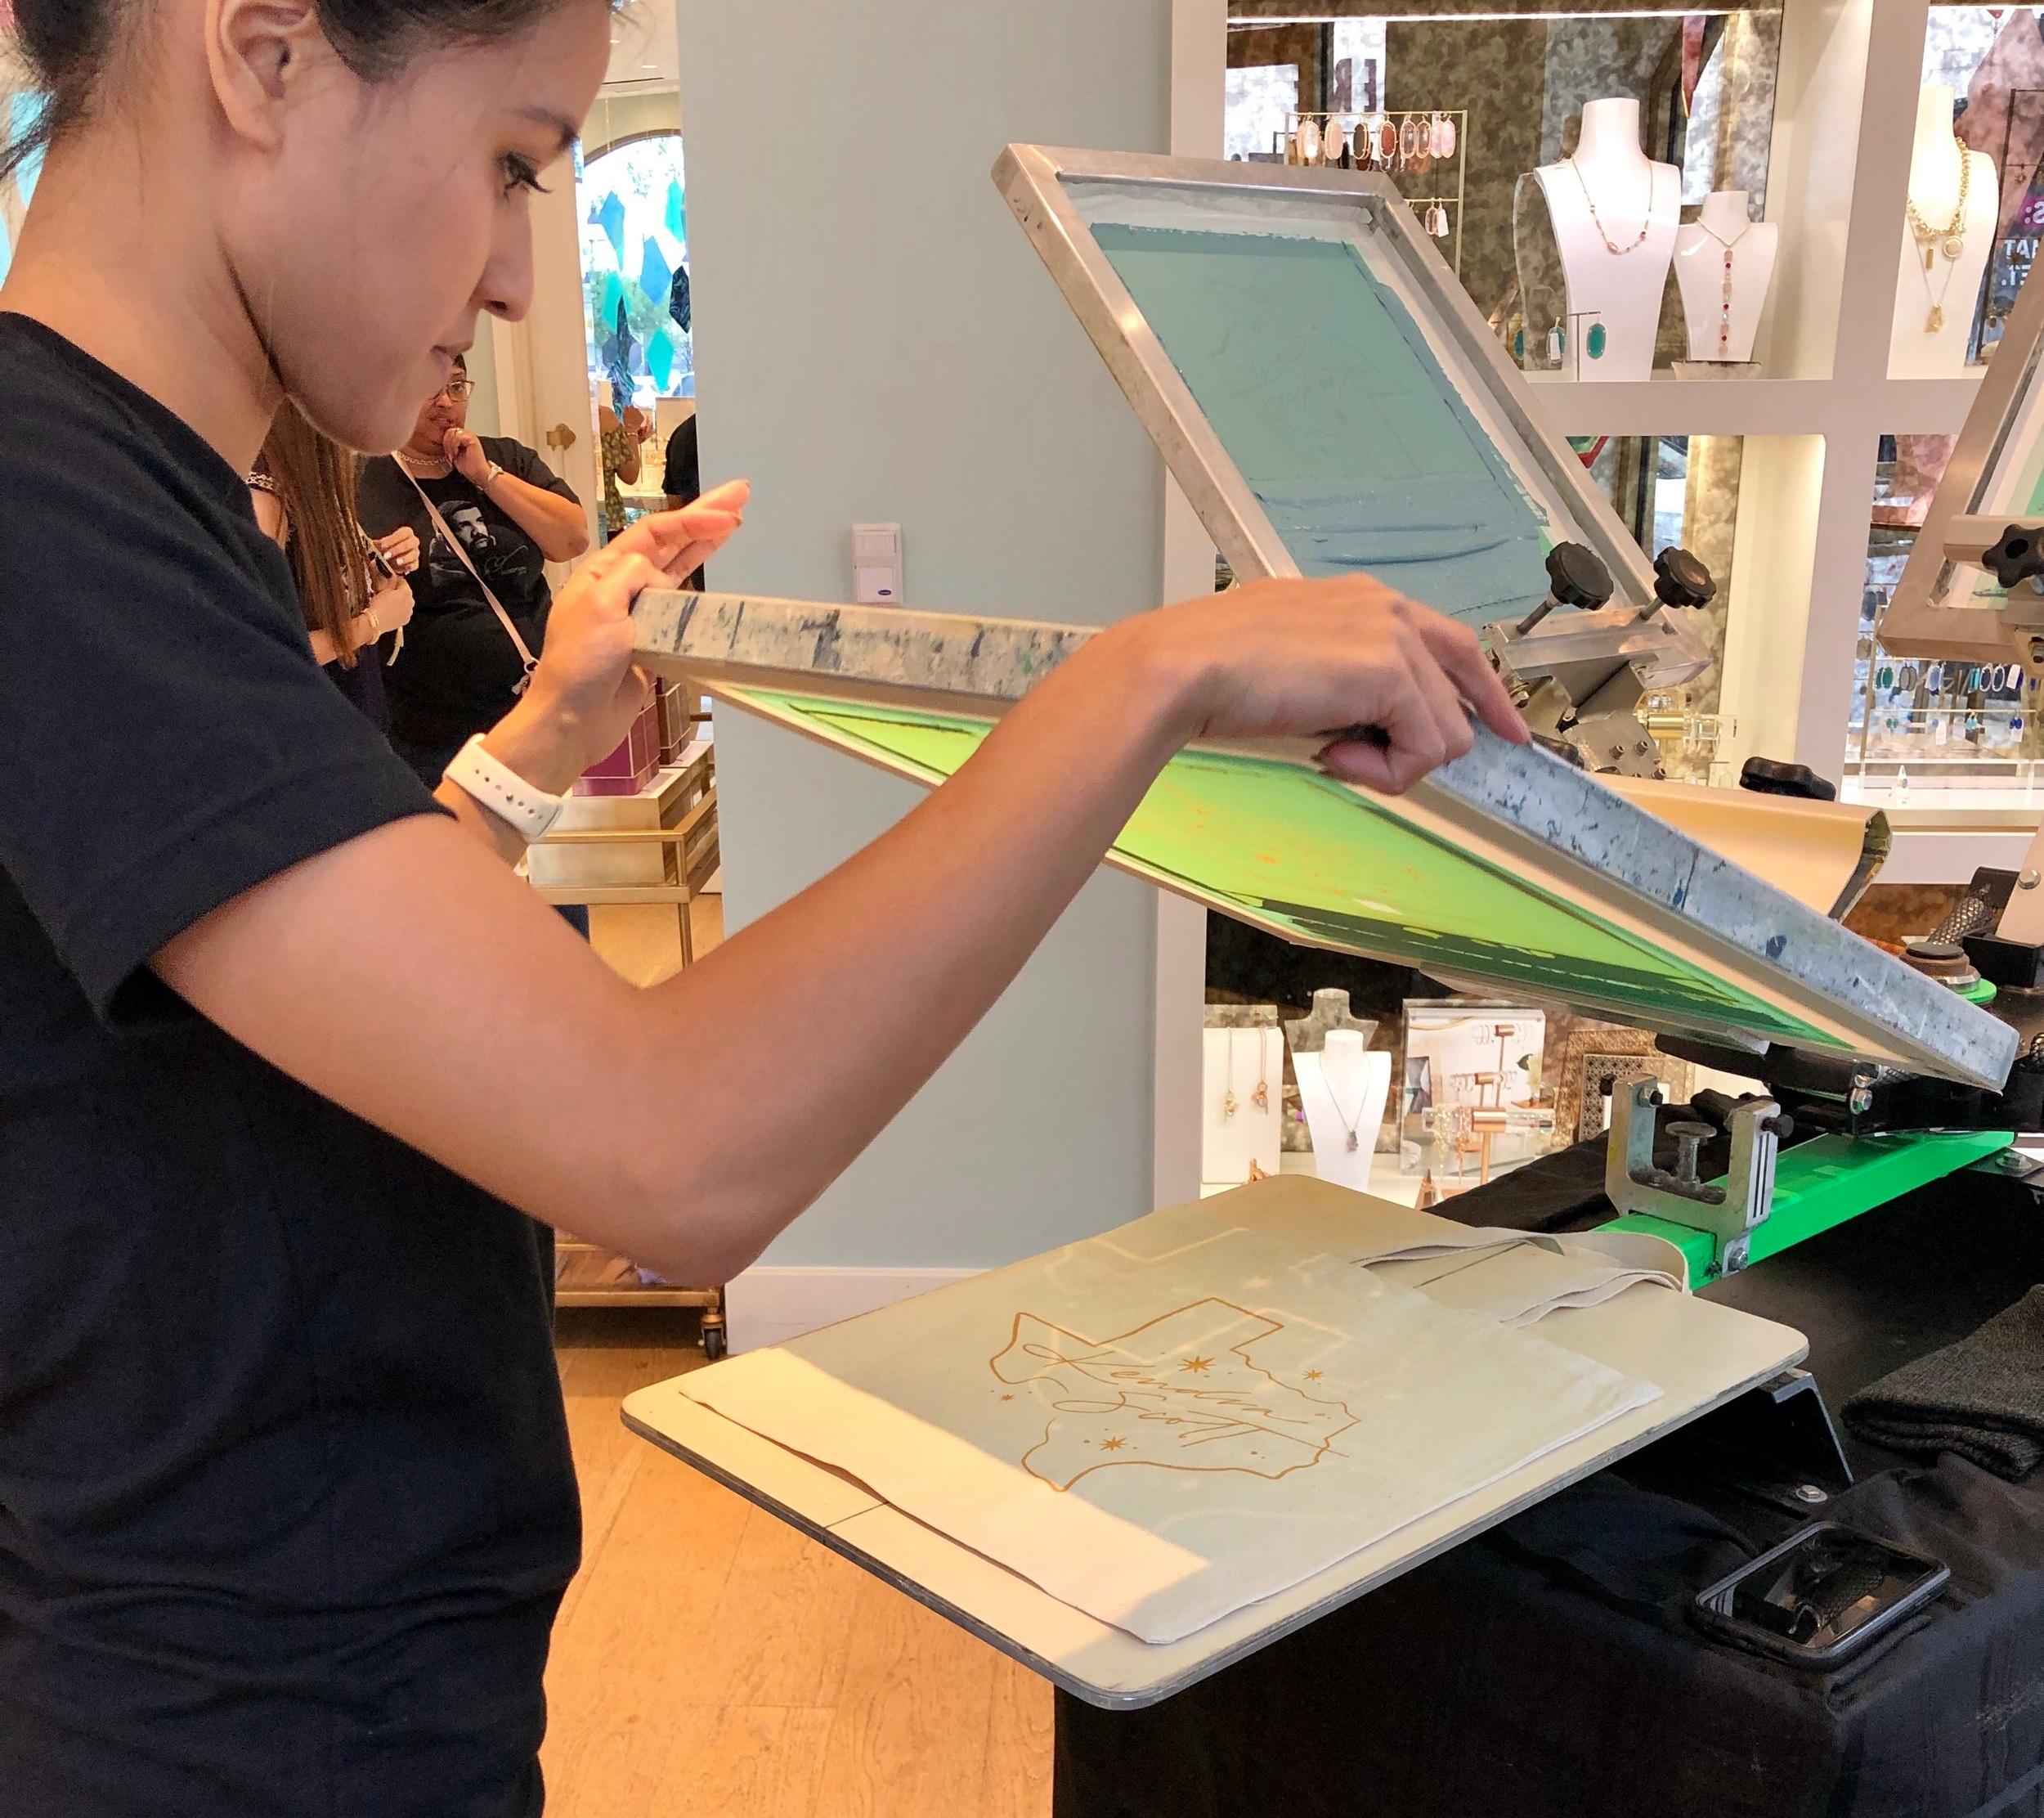 apdat-print-co-live-screen-printing-kendra-scott-press.jpg